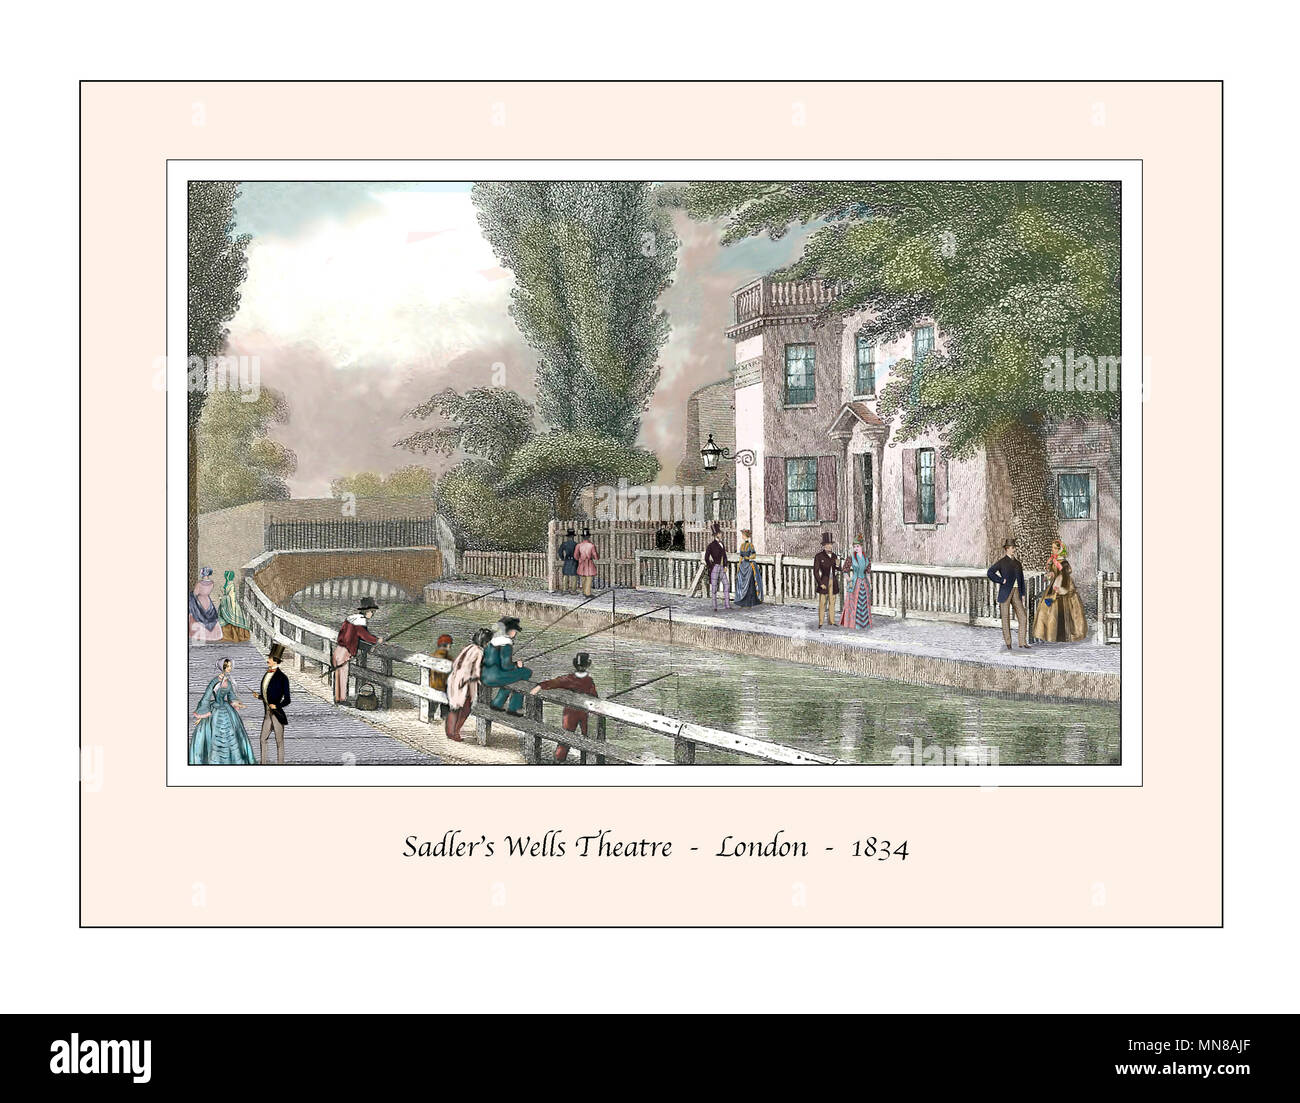 Sadler's Wells Theatre London Original Design based on a 19th century Engraving - Stock Image